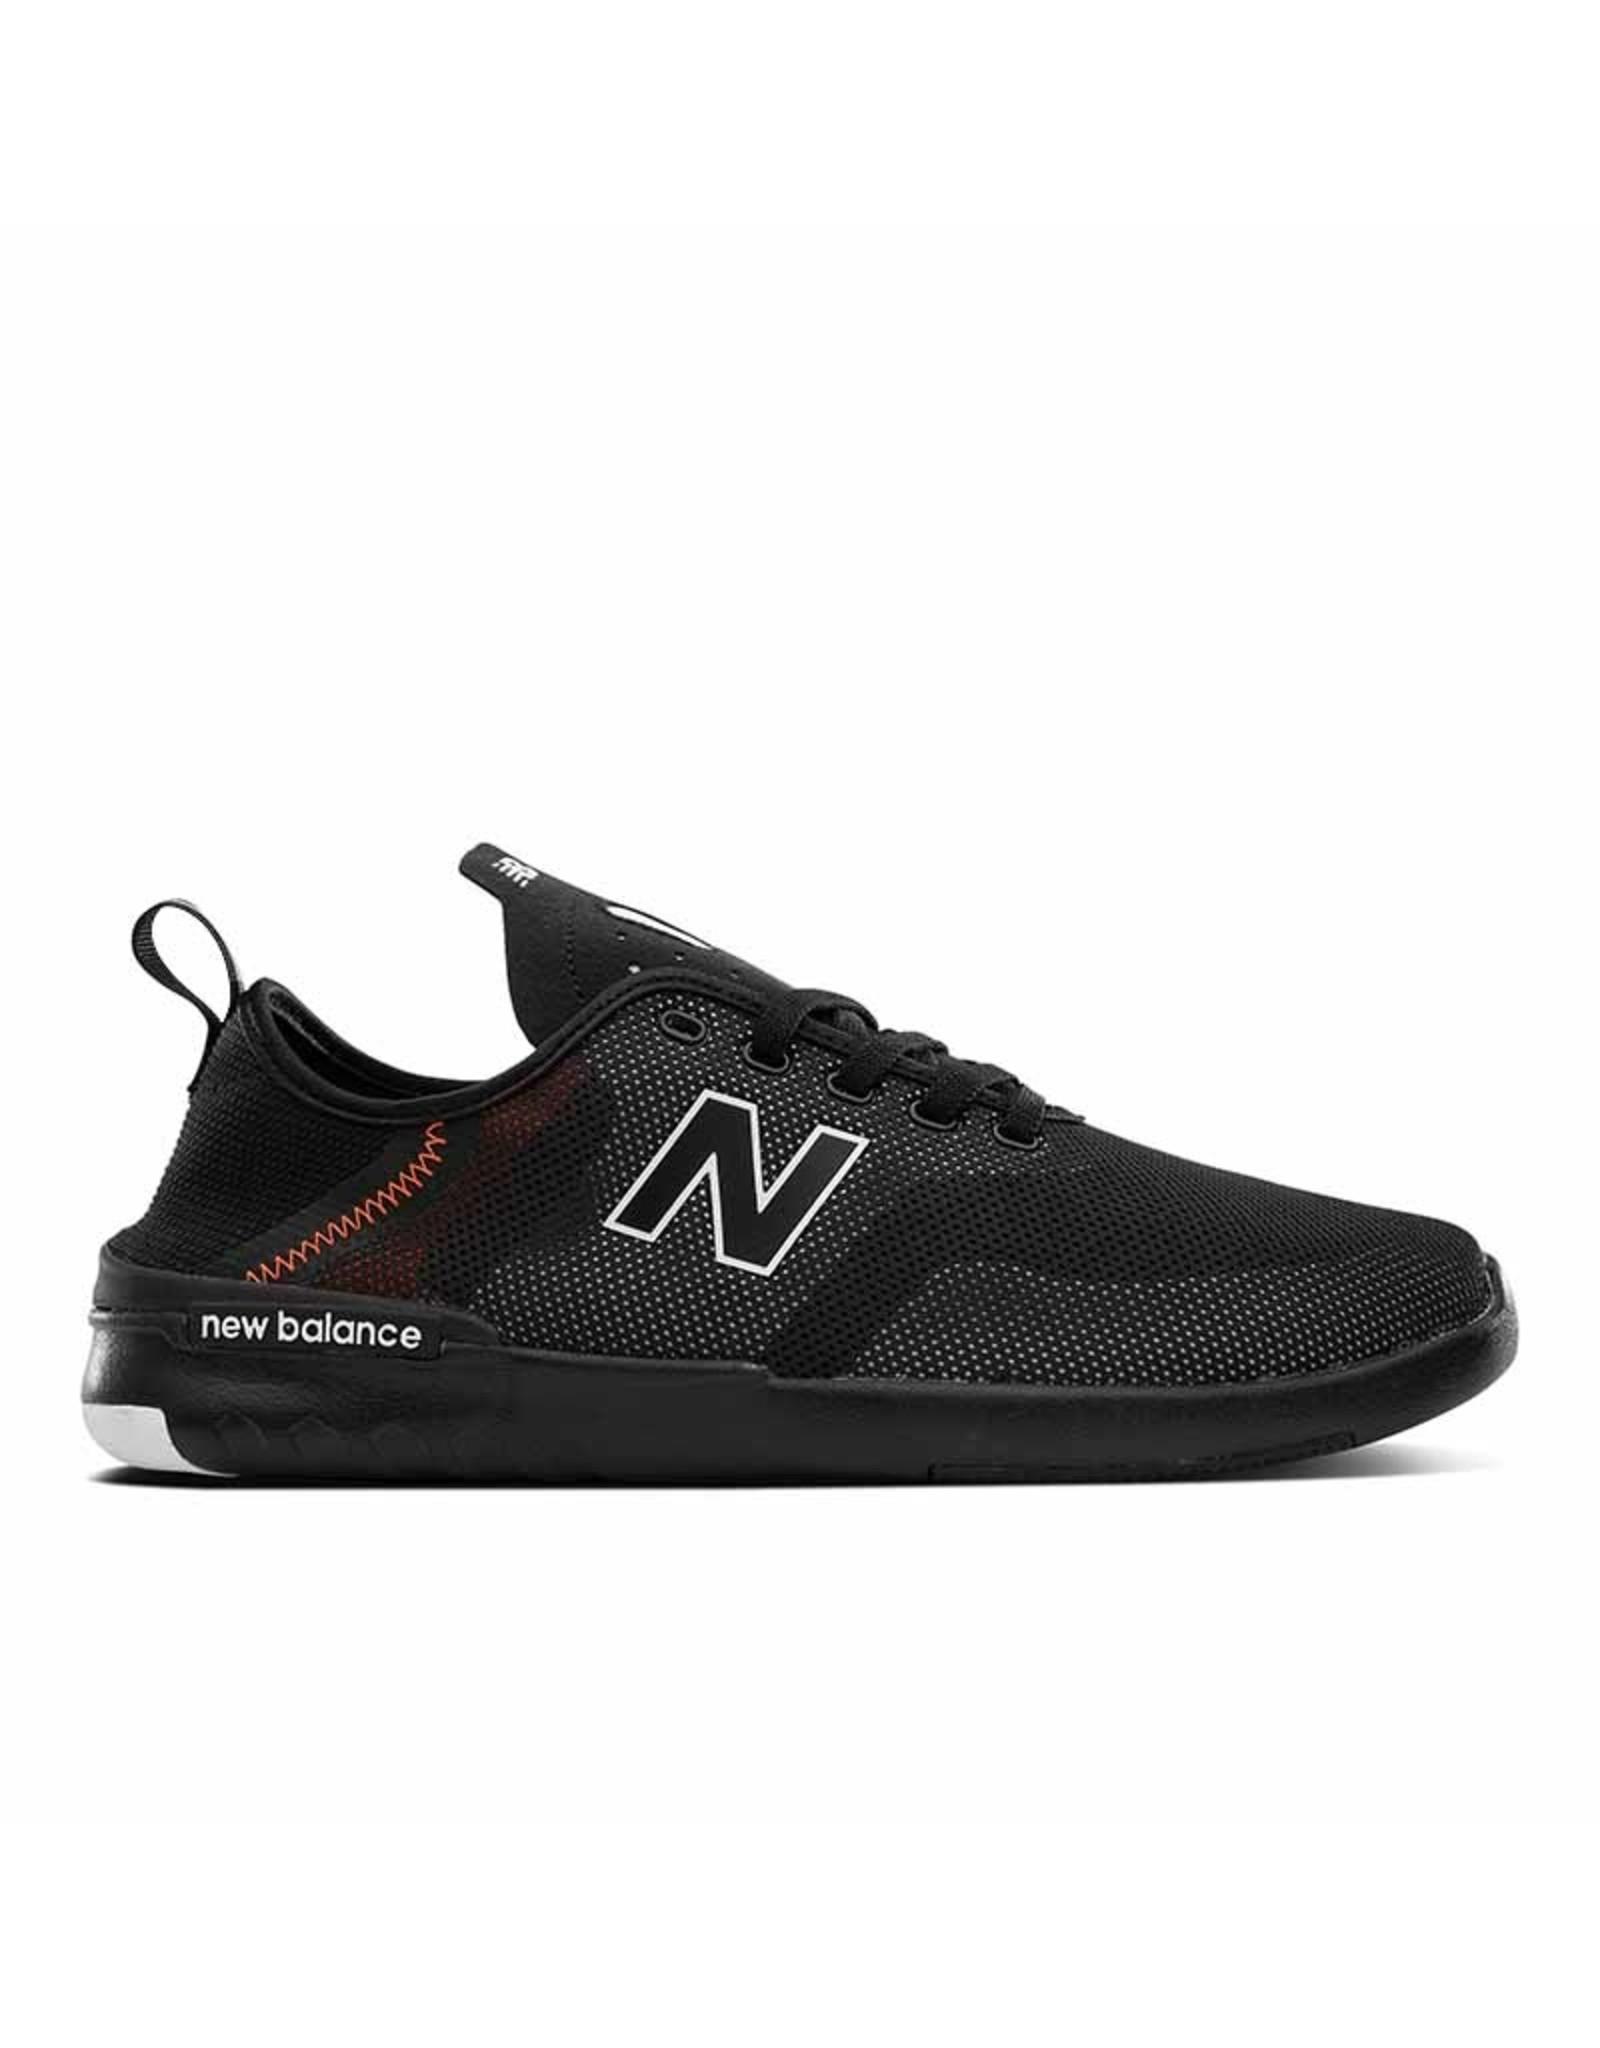 NEW BALANCE NEW BALANCE - 659 AC - BLACK/BLACK